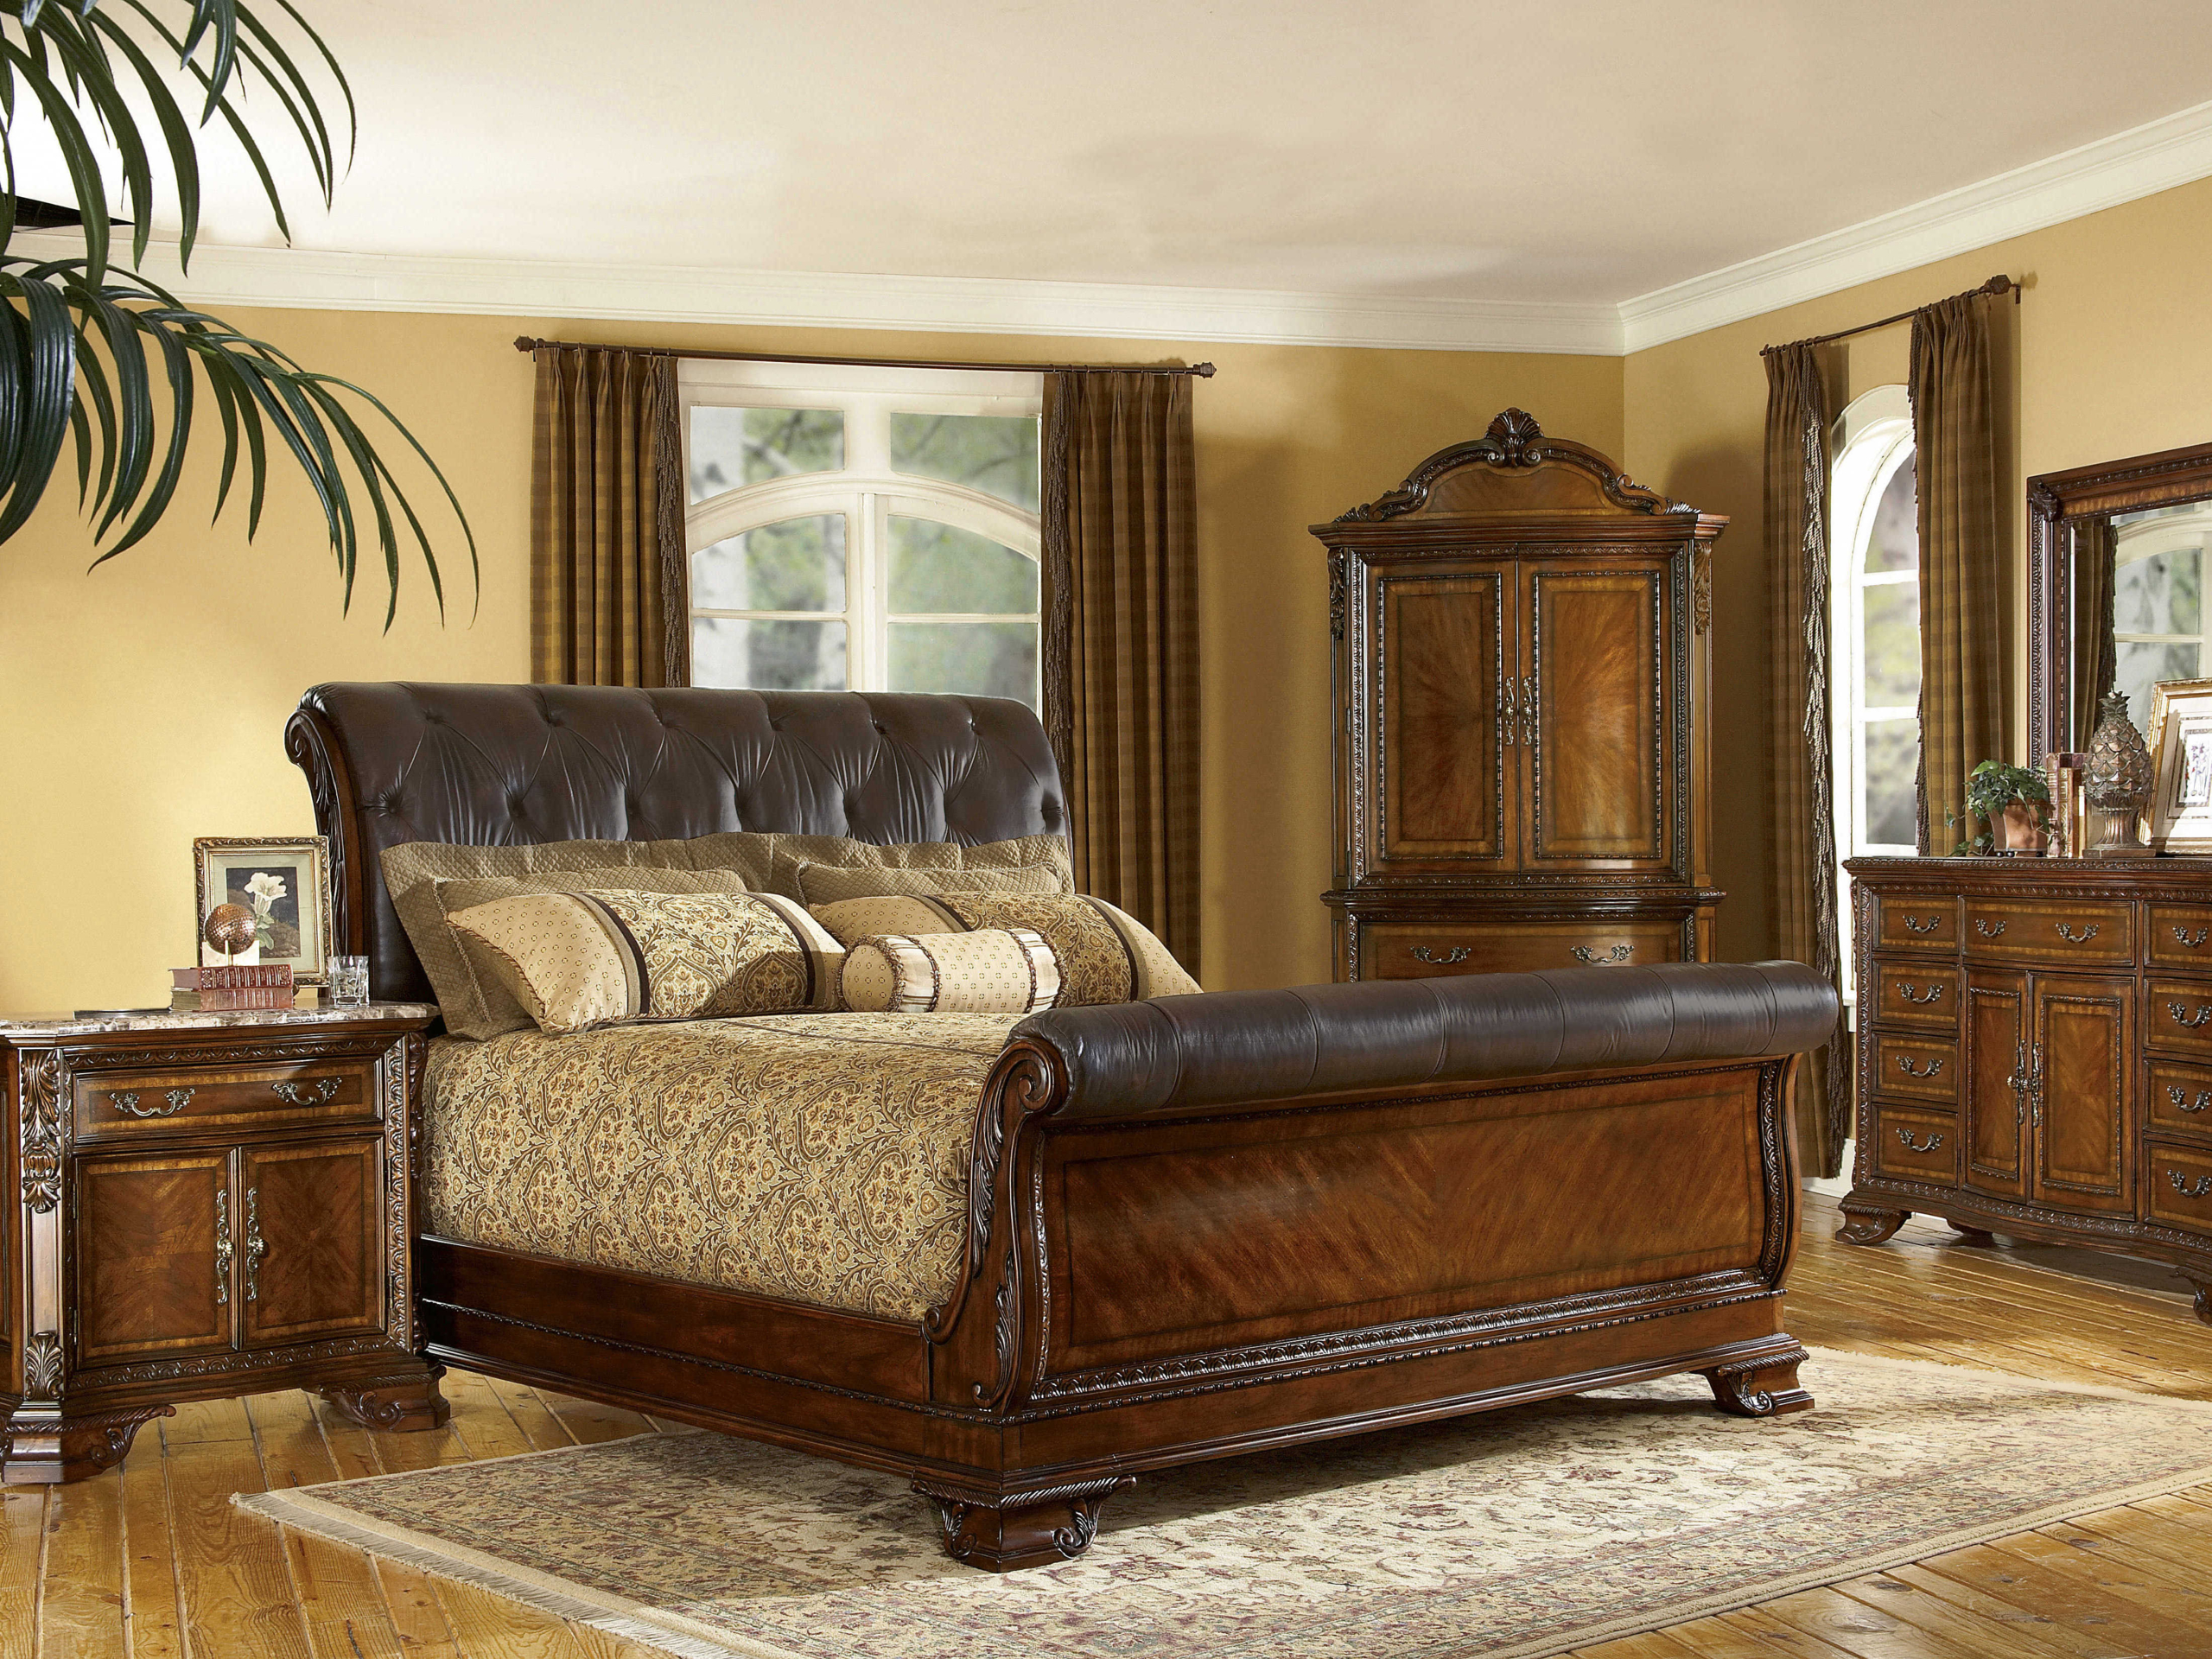 Great Leather Bedroom Set Design Ideas